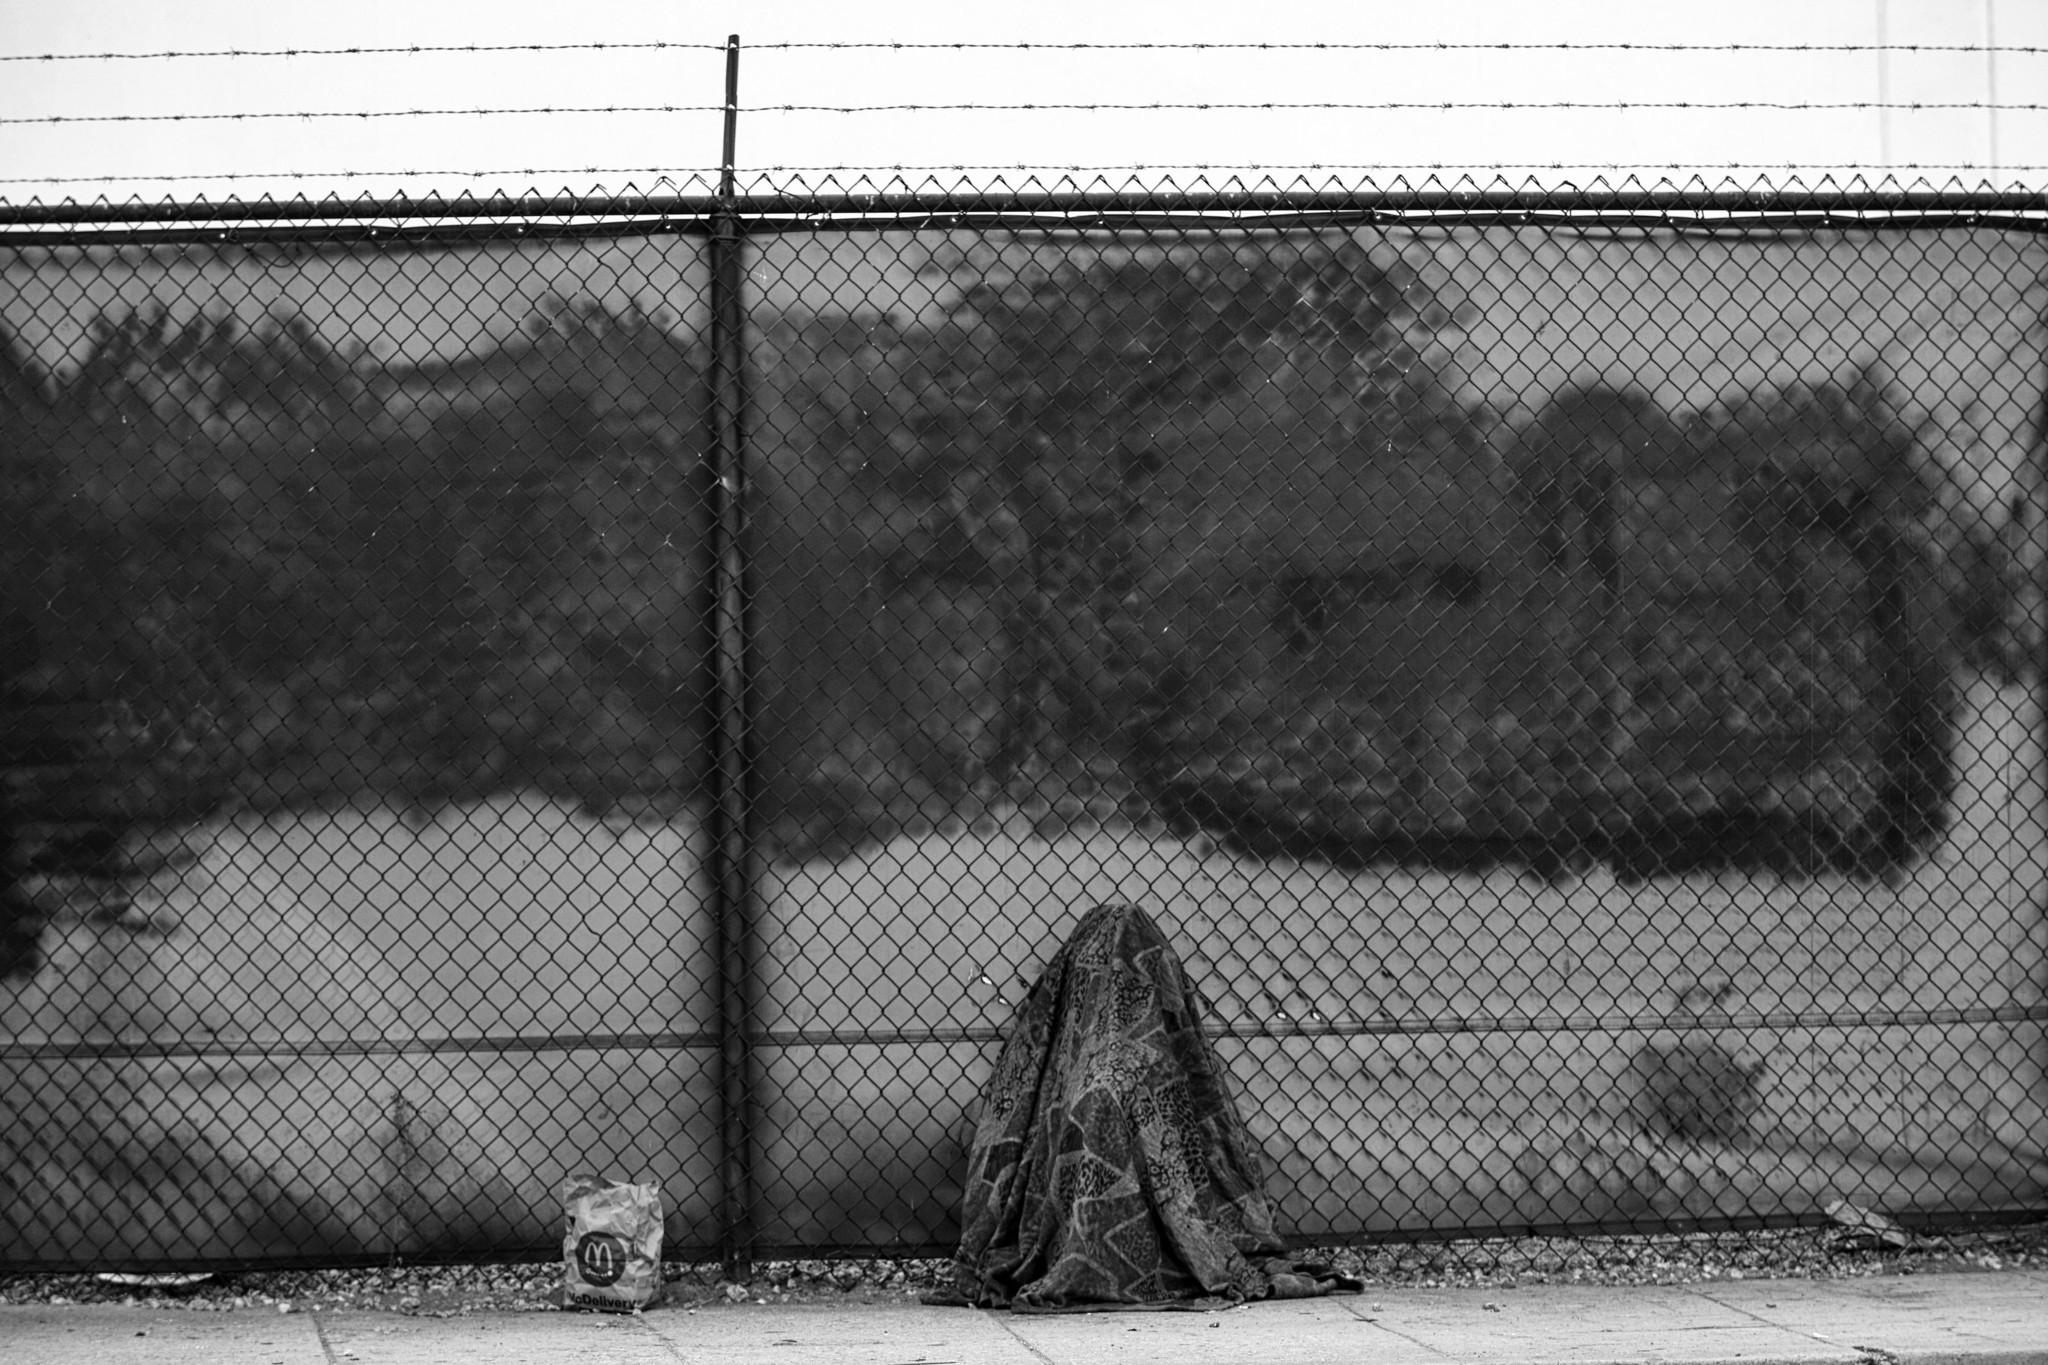 LOS ANGELES, CA NOVEMBER 8, 2017: A homeless person sits under a blanket next to a McDonald's bag ne